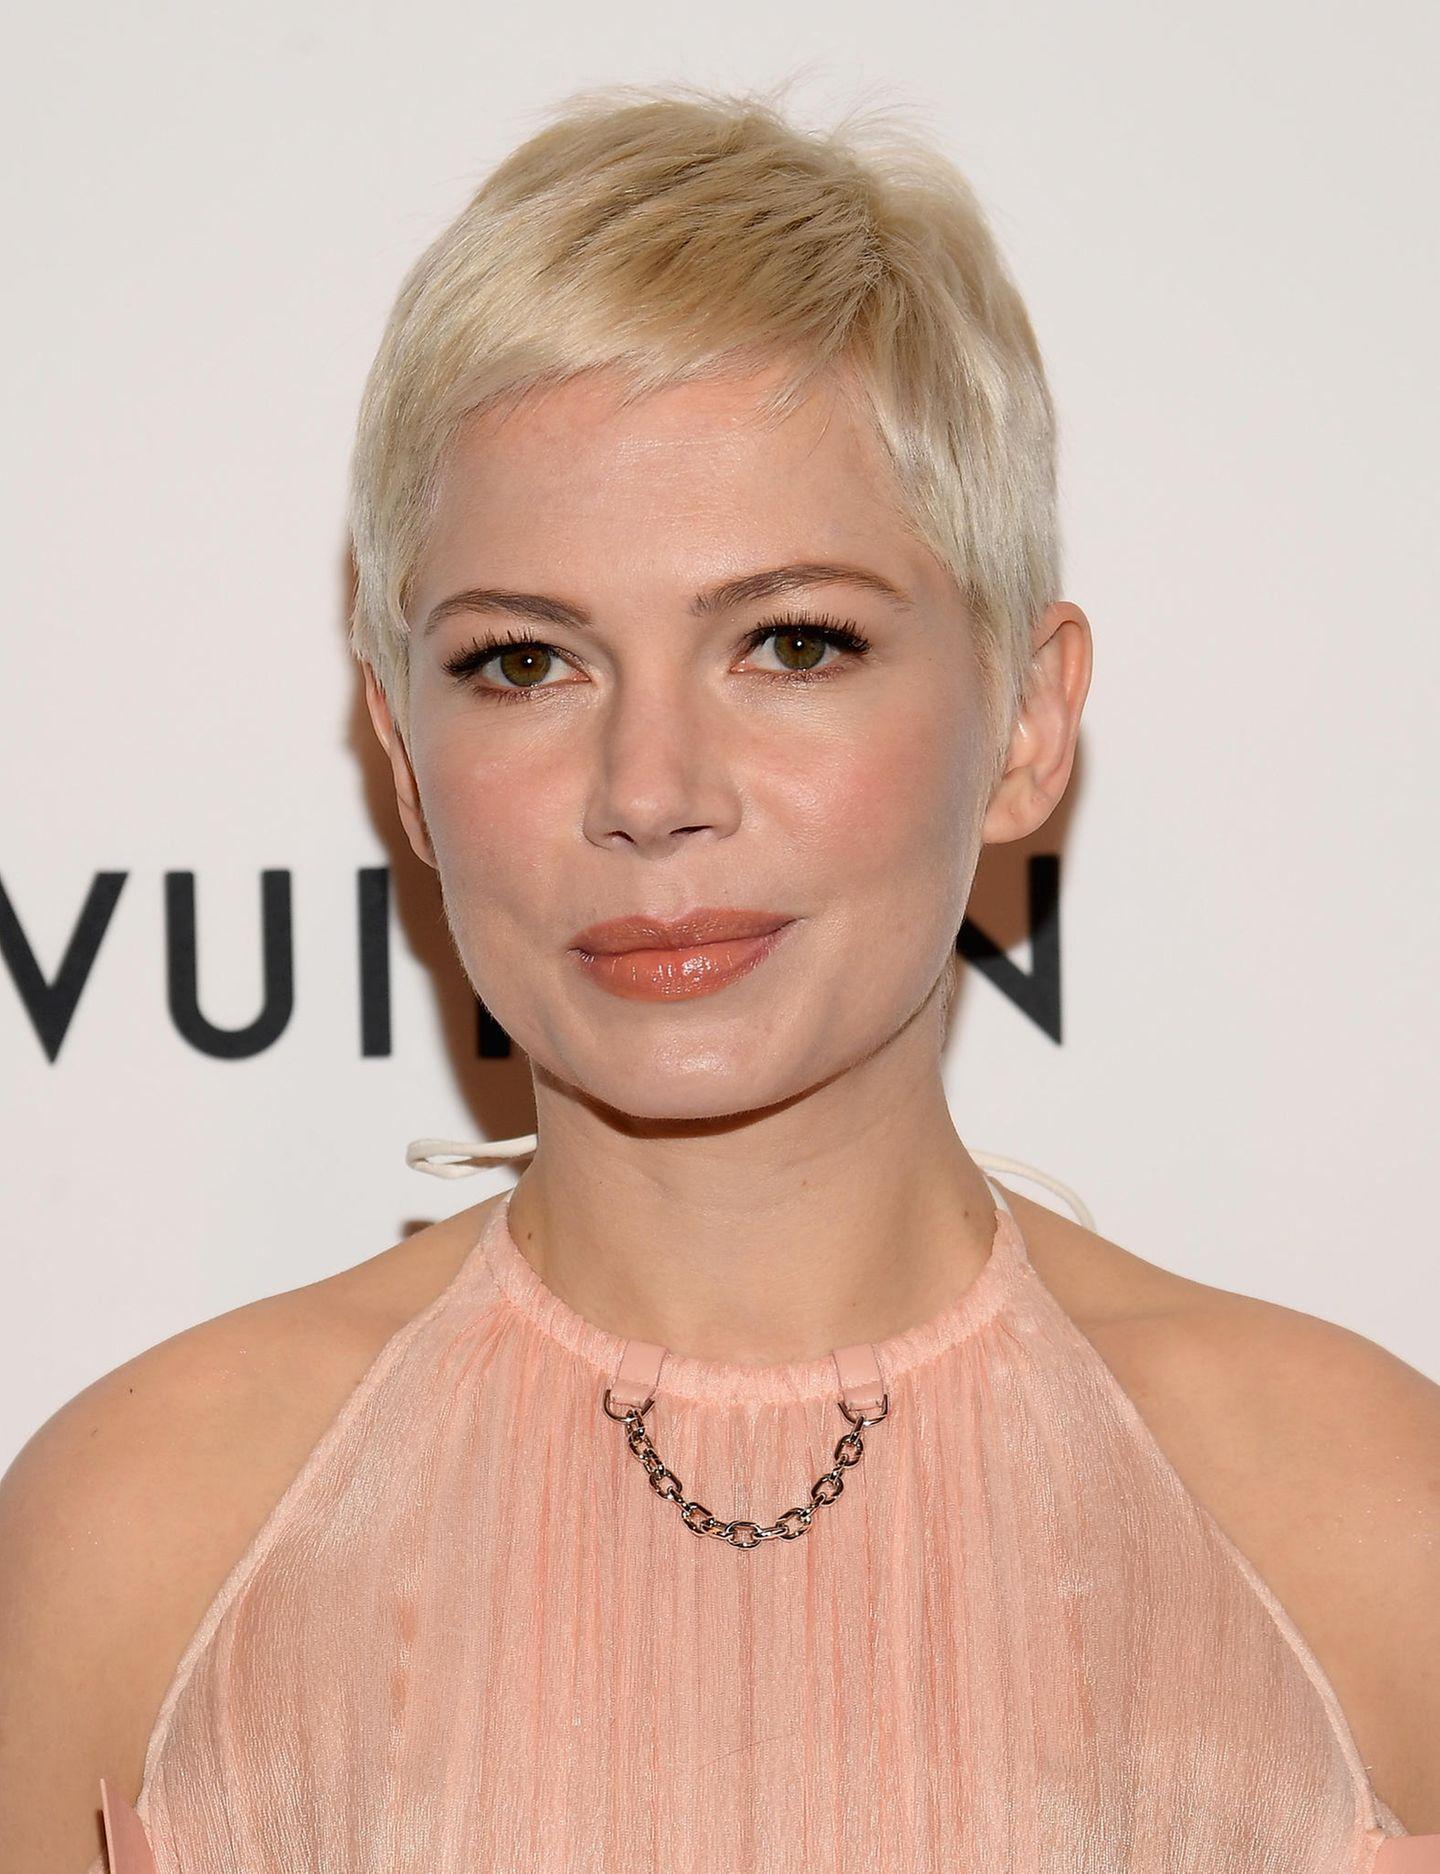 Kurze Haare stylen: Pixie Cut an Michelle Williams